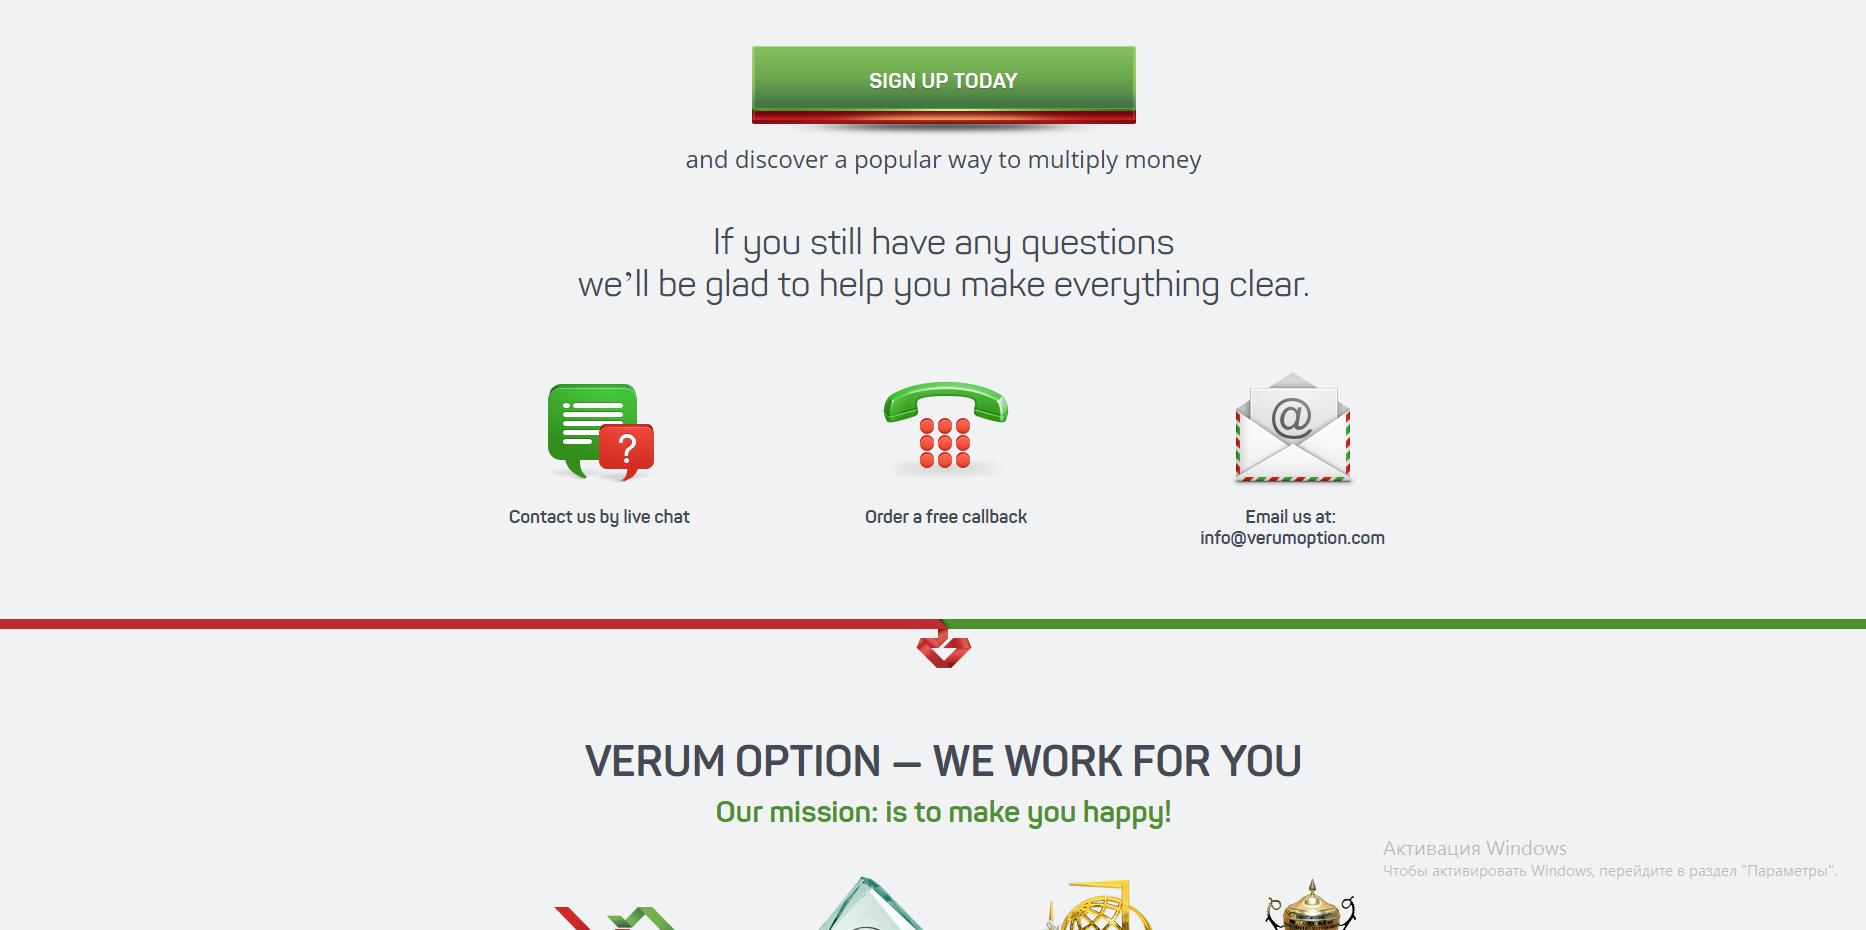 Verum Option Contact